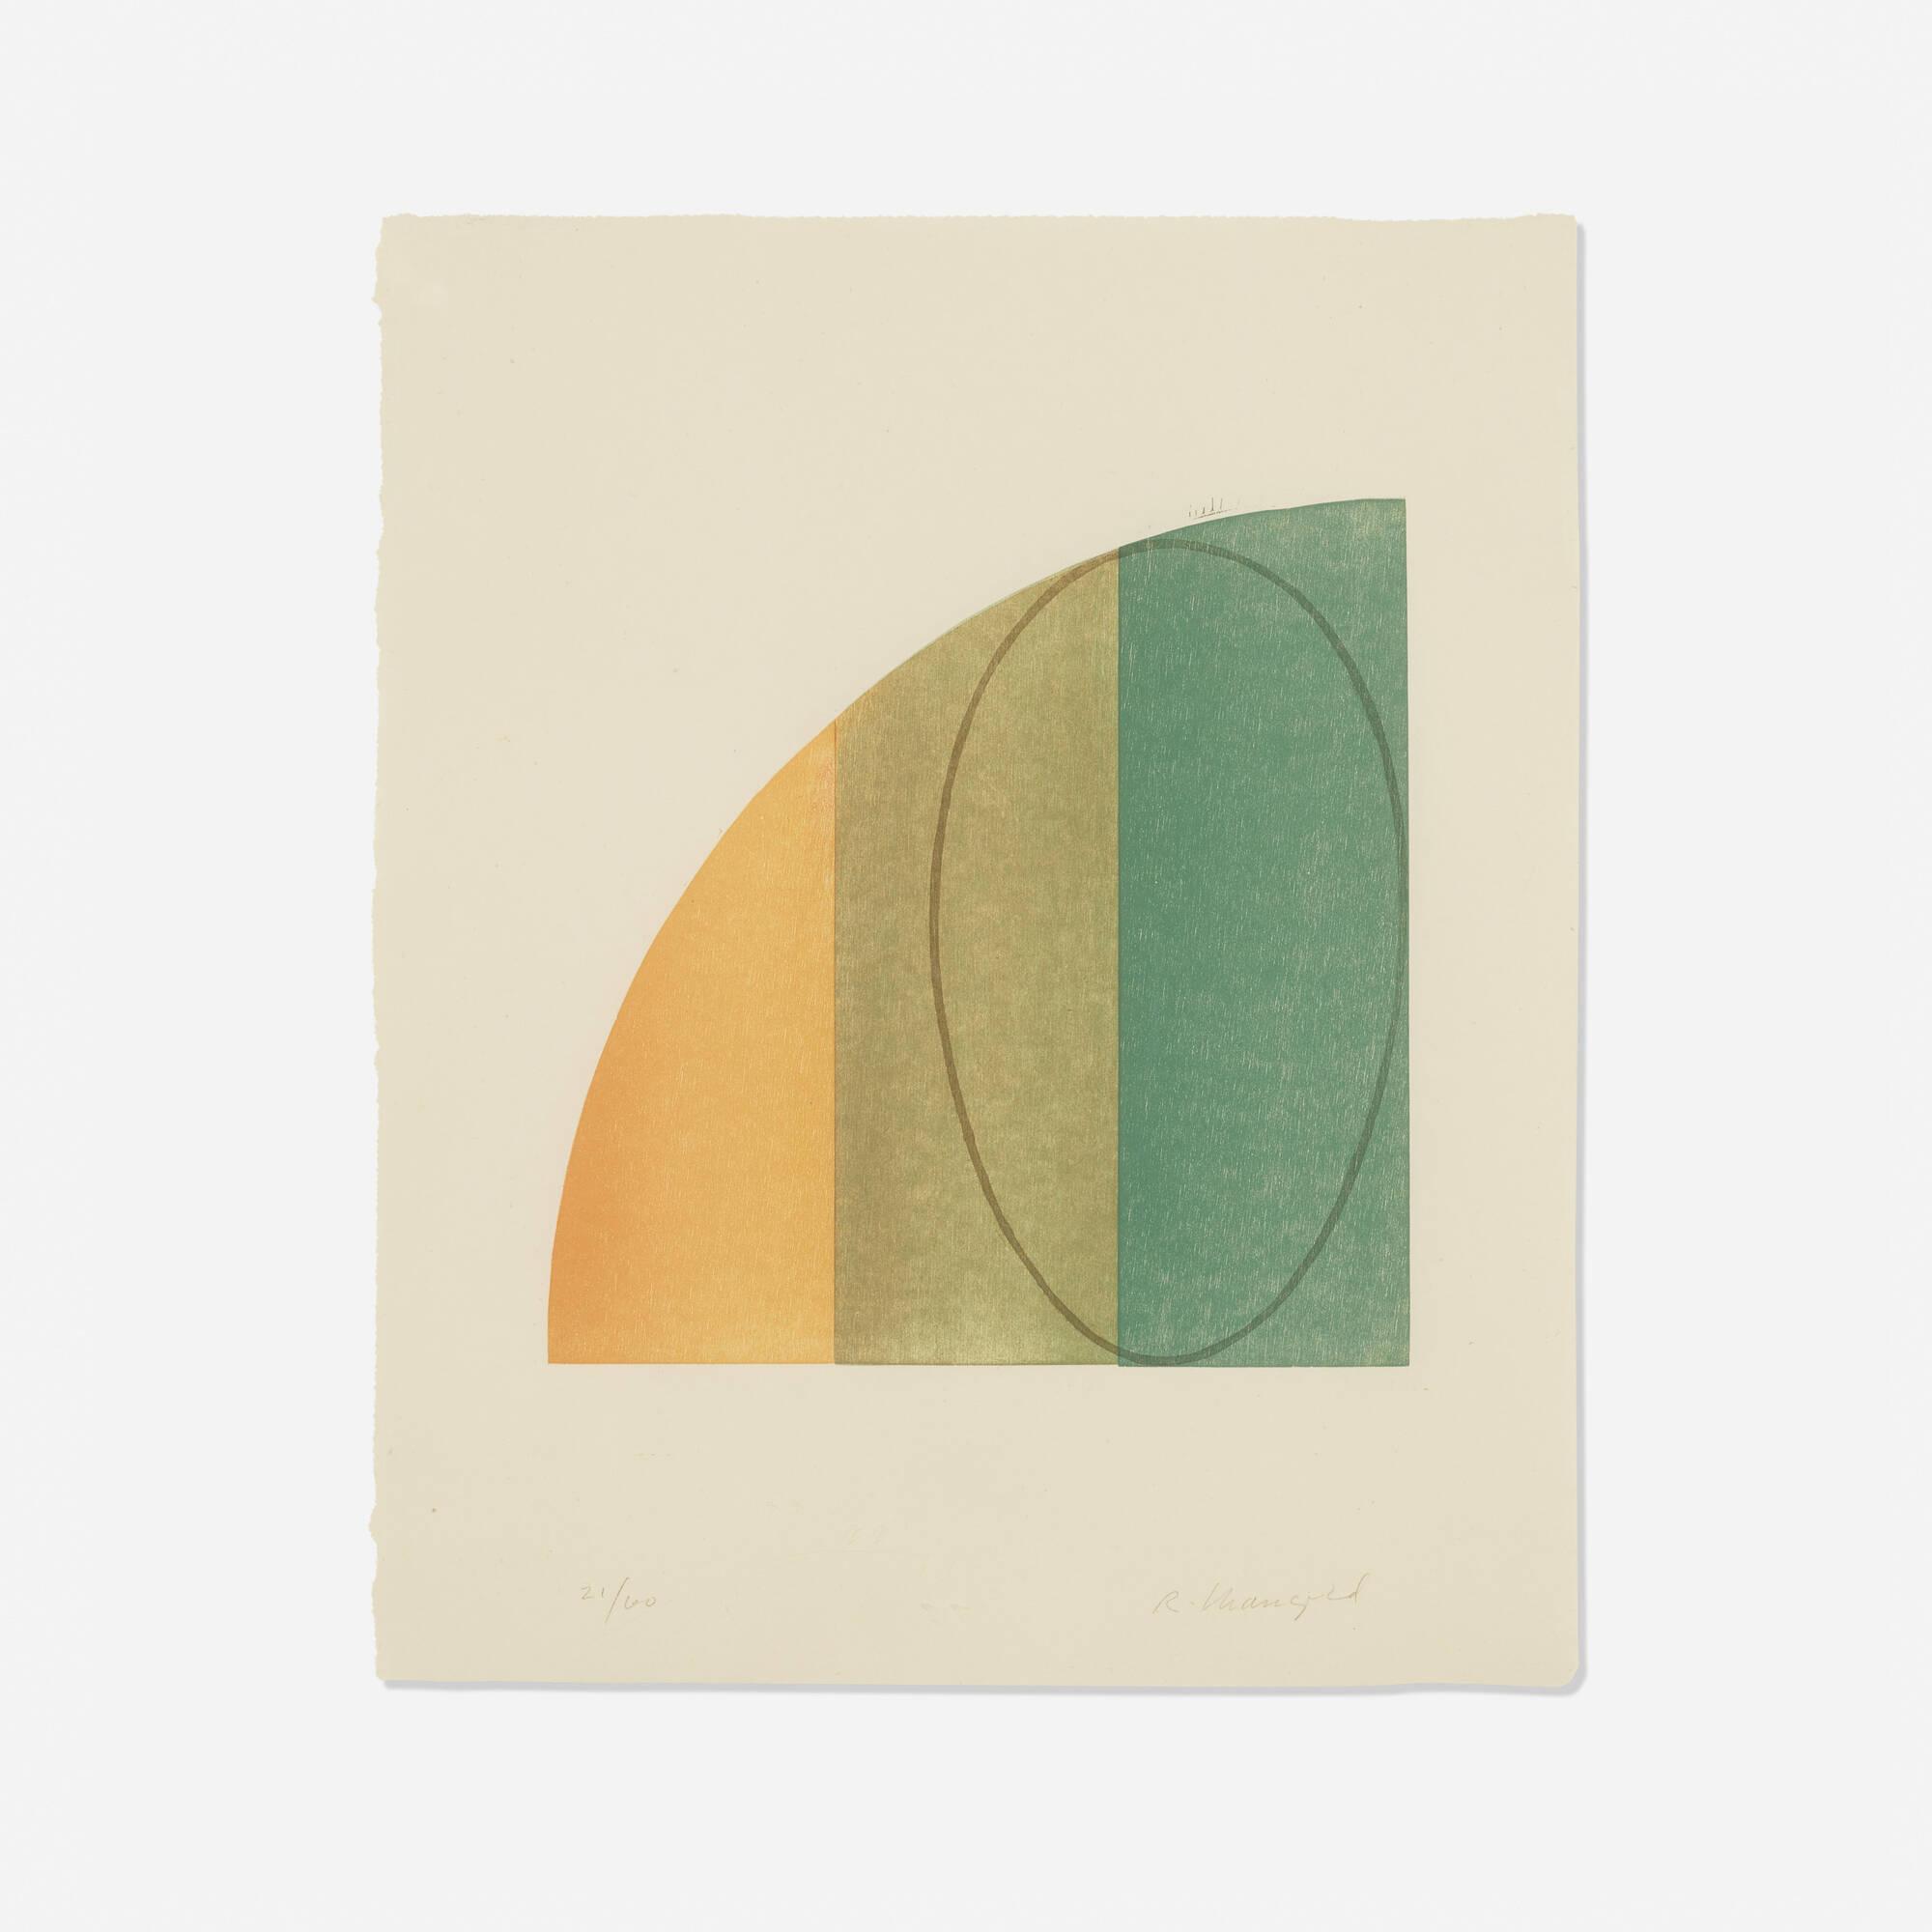 104: Robert Mangold / Curved Plane/Figure III (1 of 1)